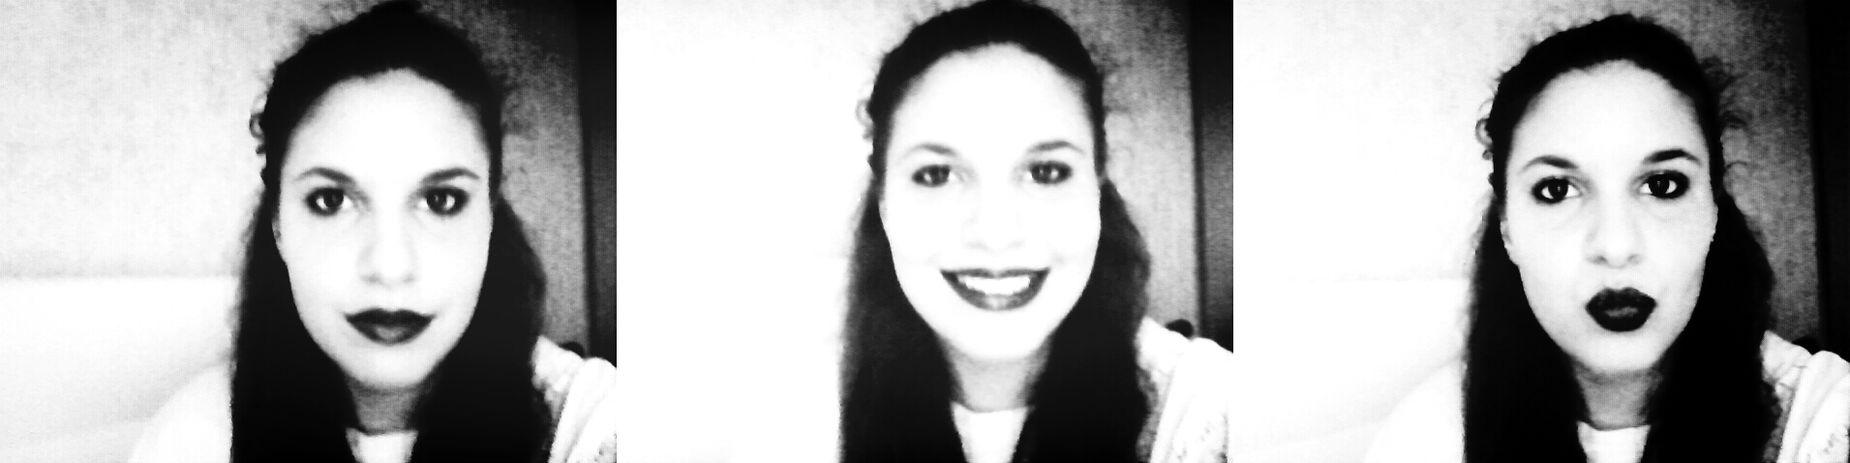 Black And White Selfie ✌ Girl Red Lips